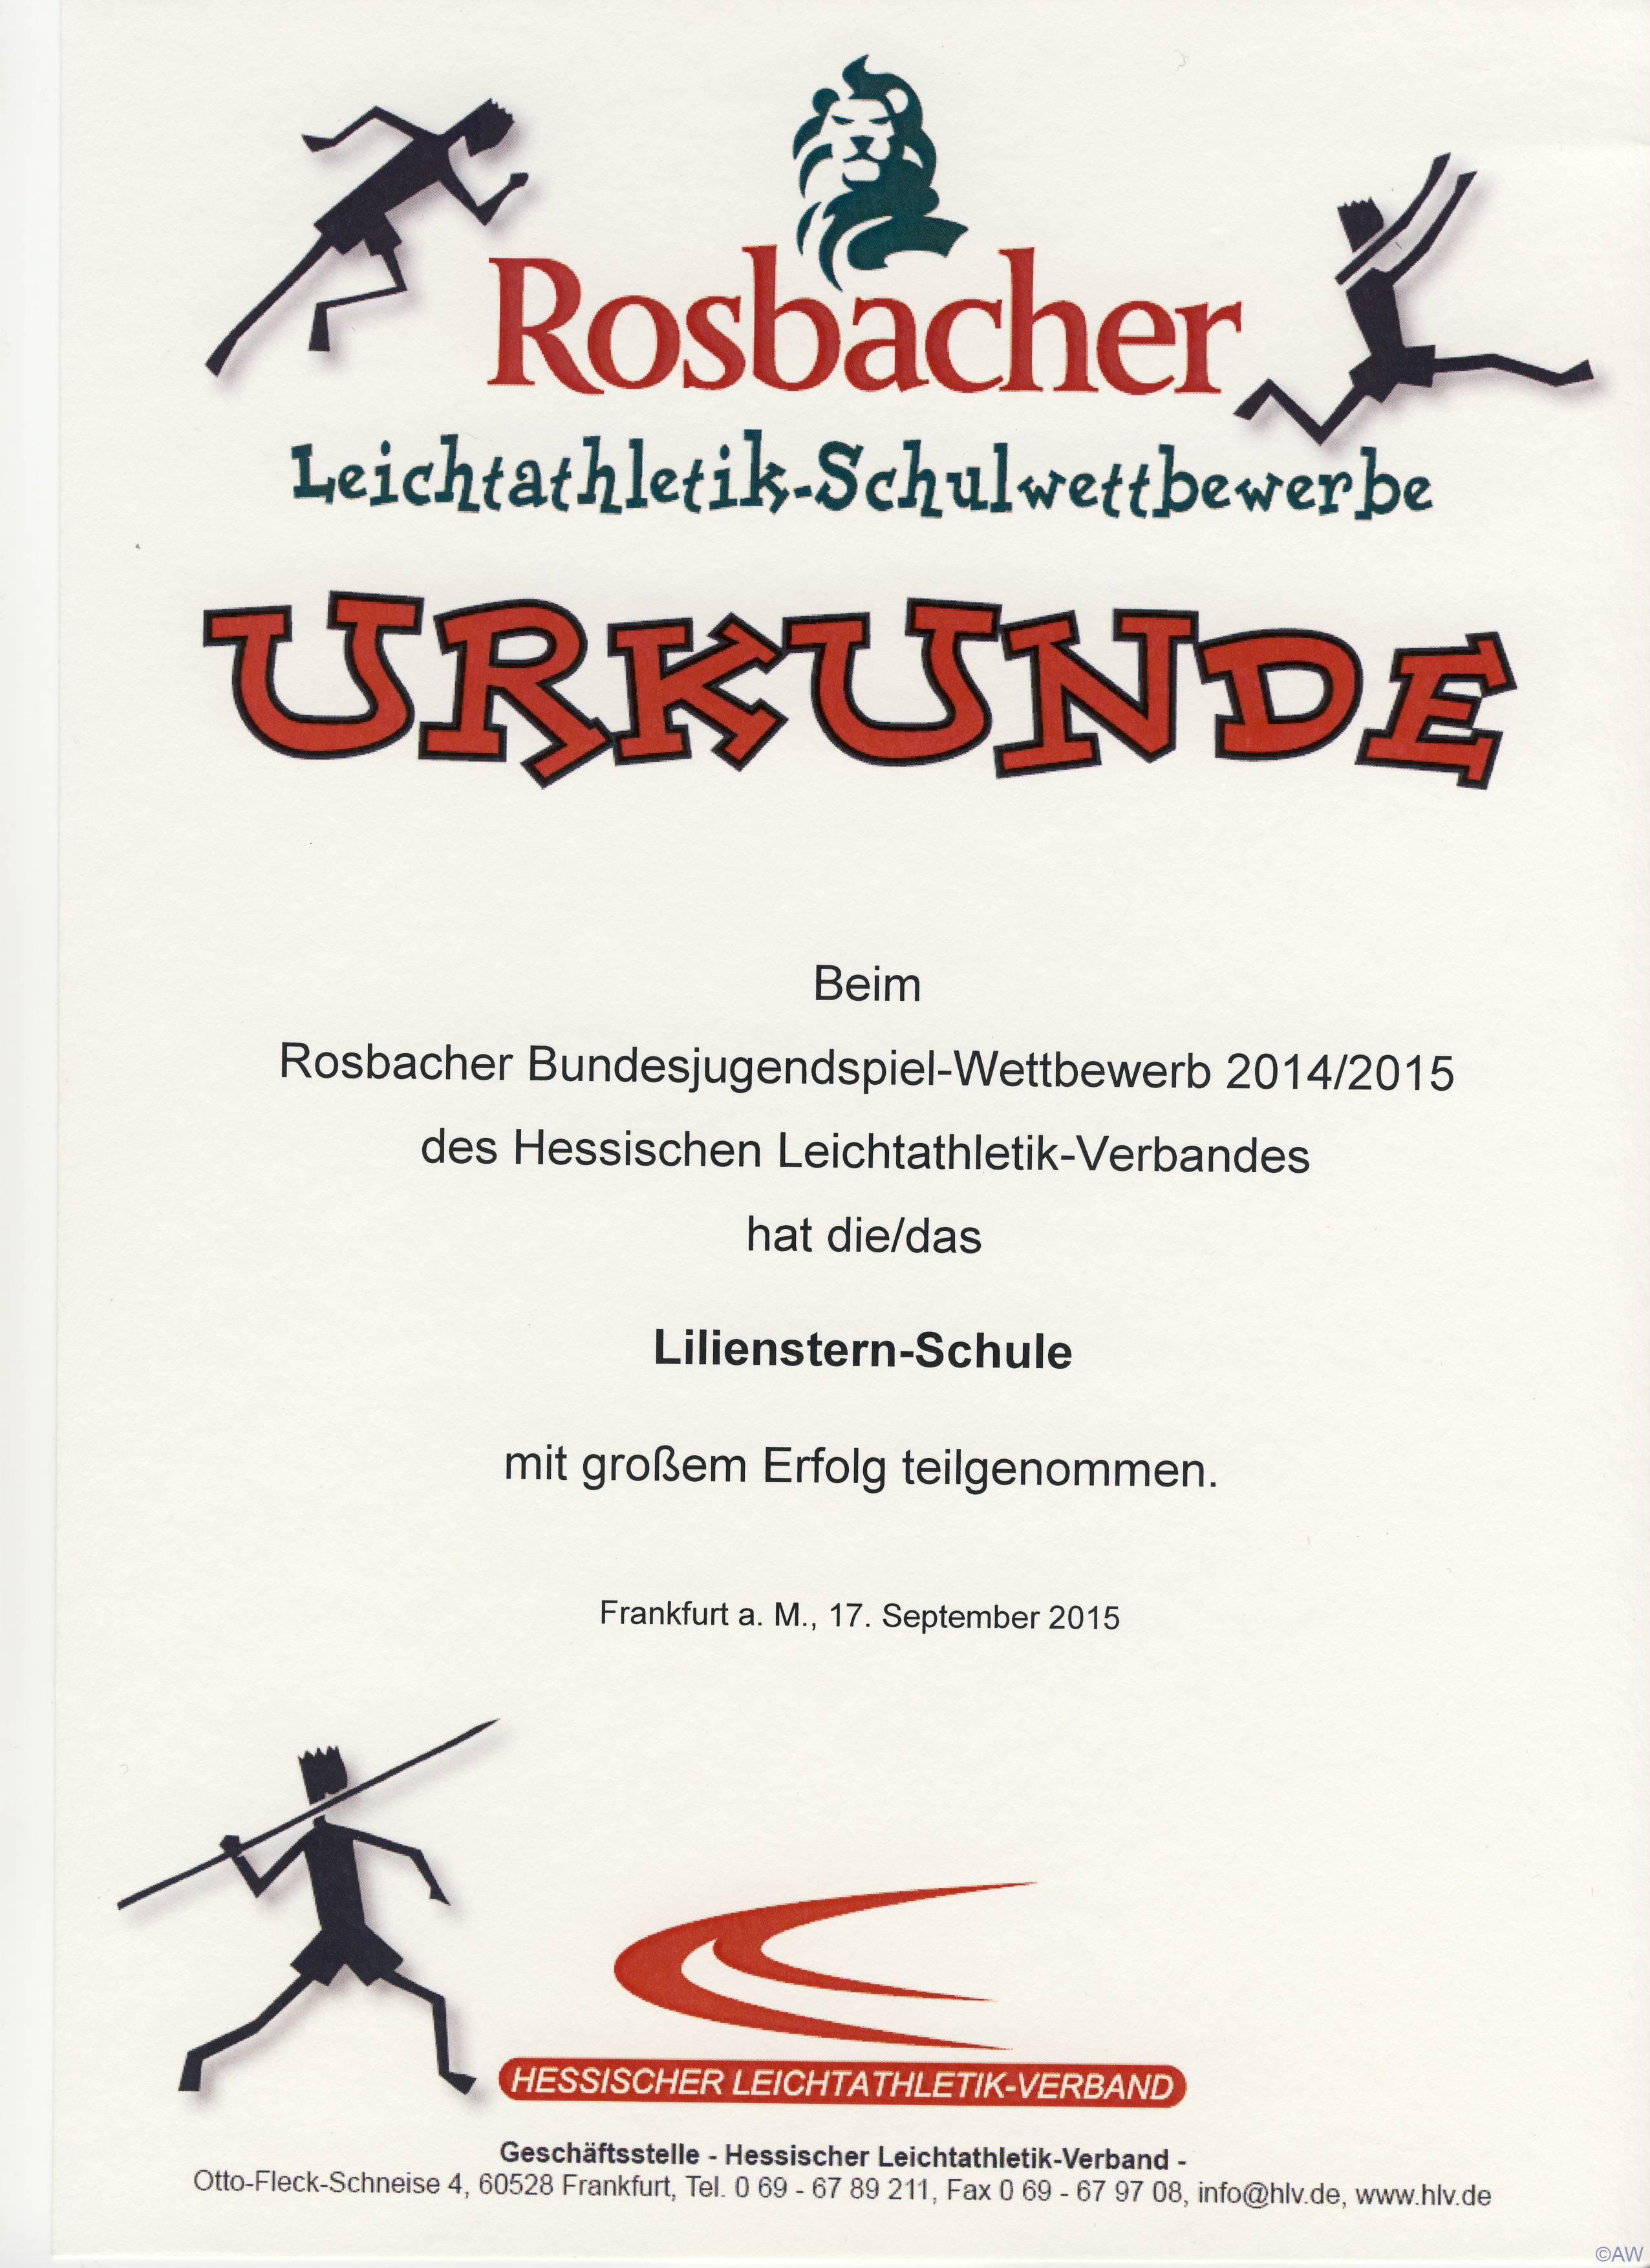 Rosbacher-Schulwettbewerbe 2014/15